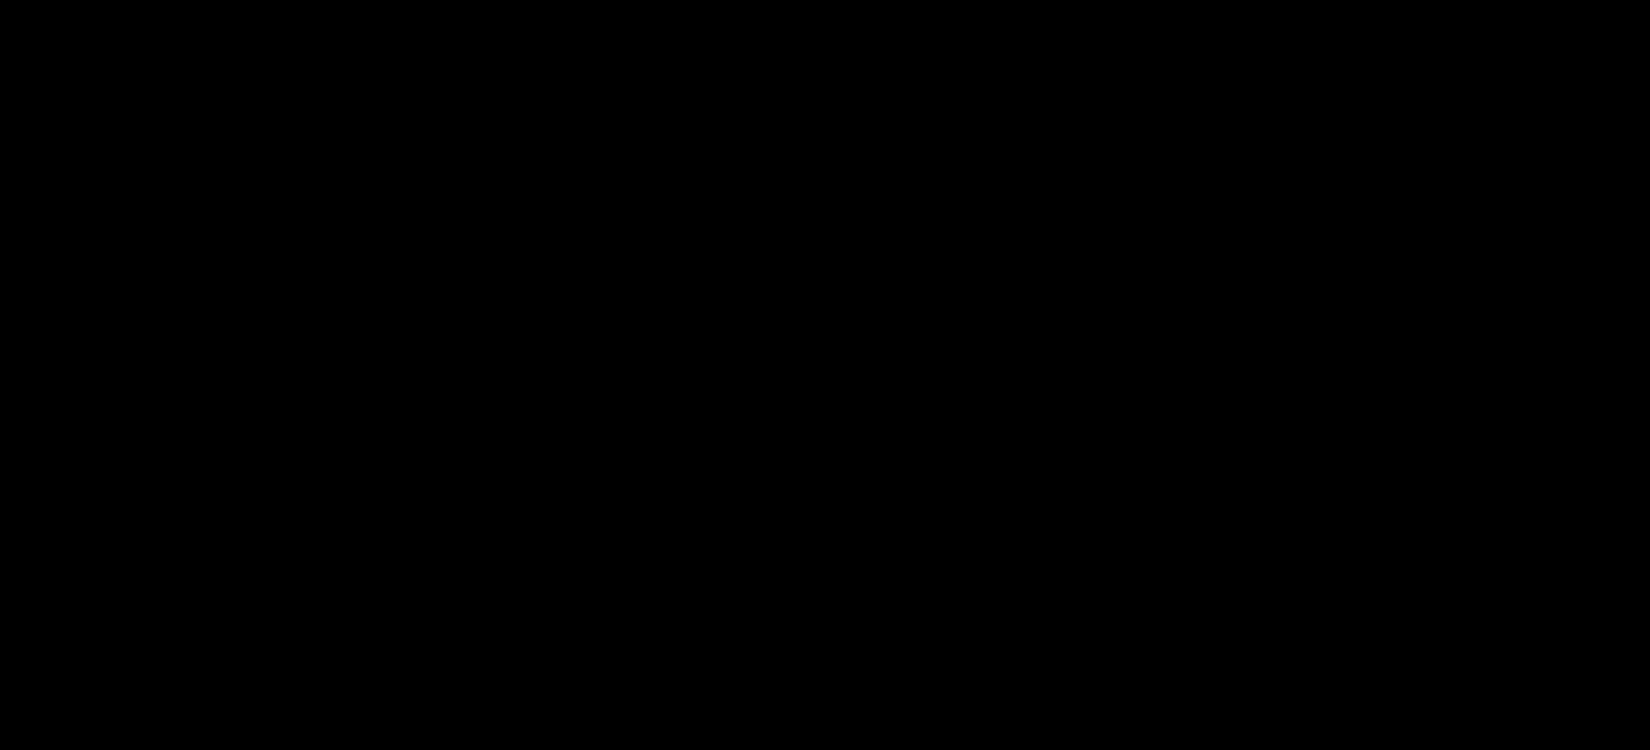 slogan for jose rizal